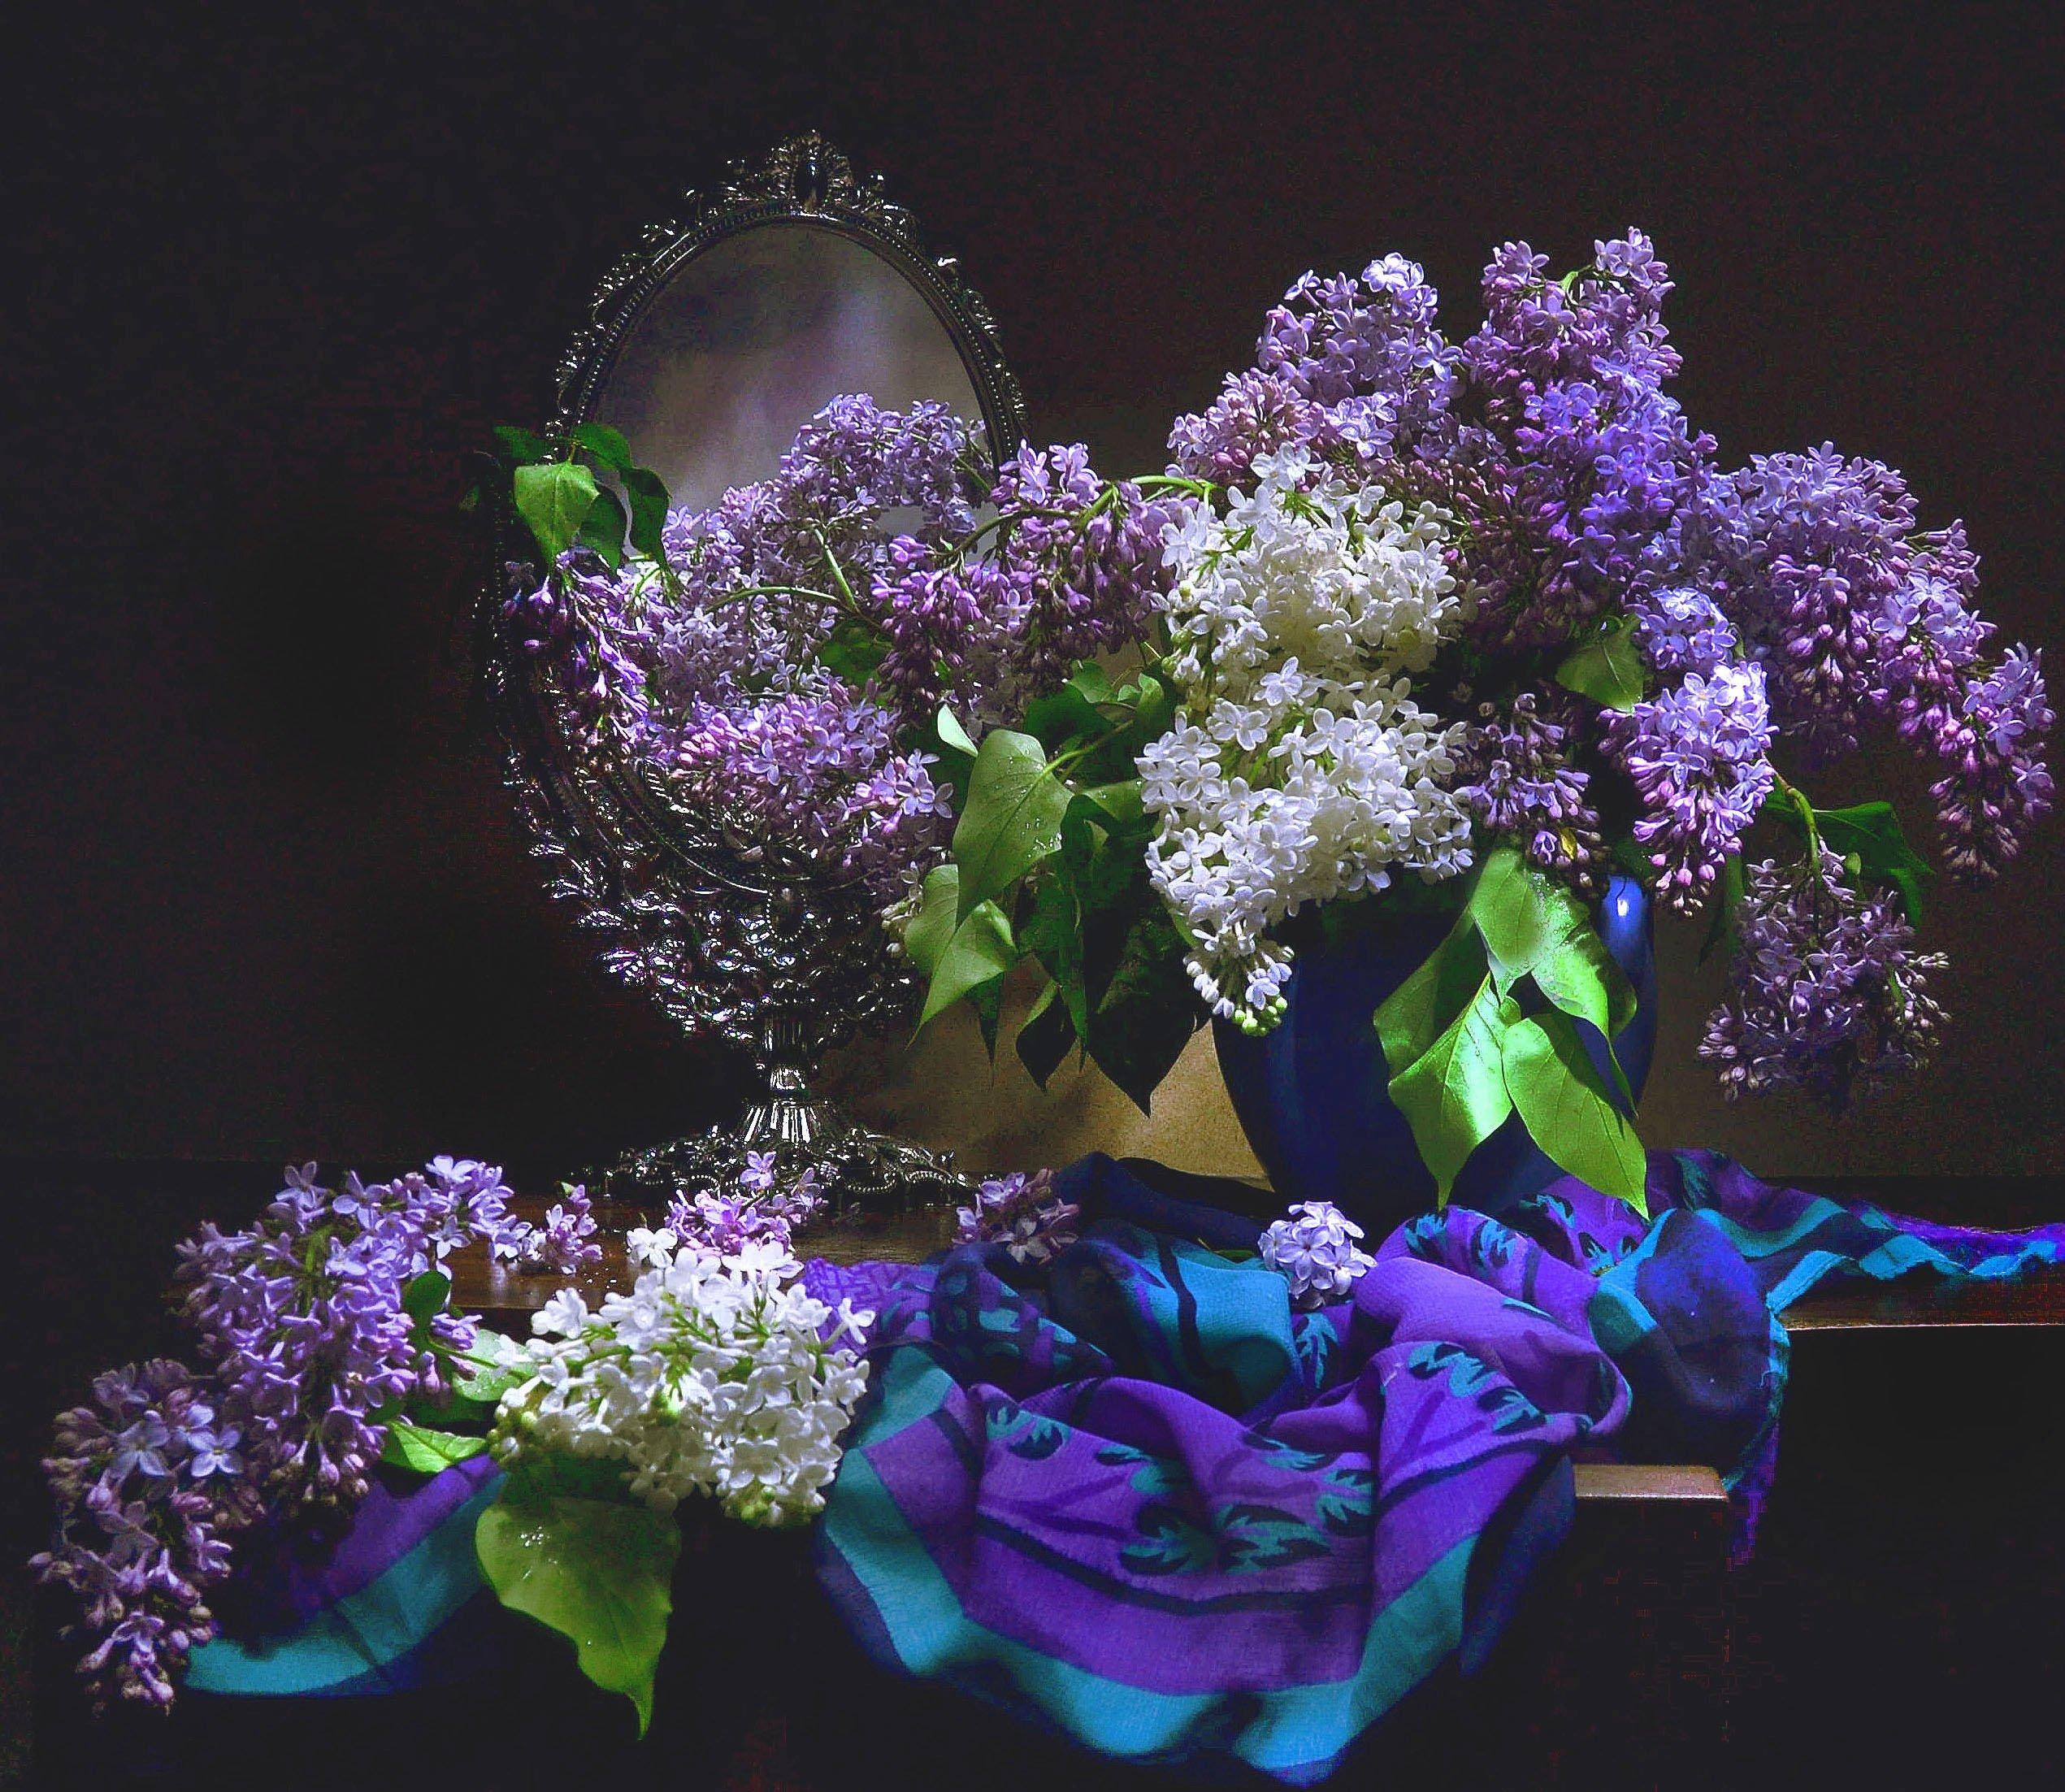 still life, натюрморт , весна, зеркало, отражение, сирень, стихи, фото натюрморт, Колова Валентина